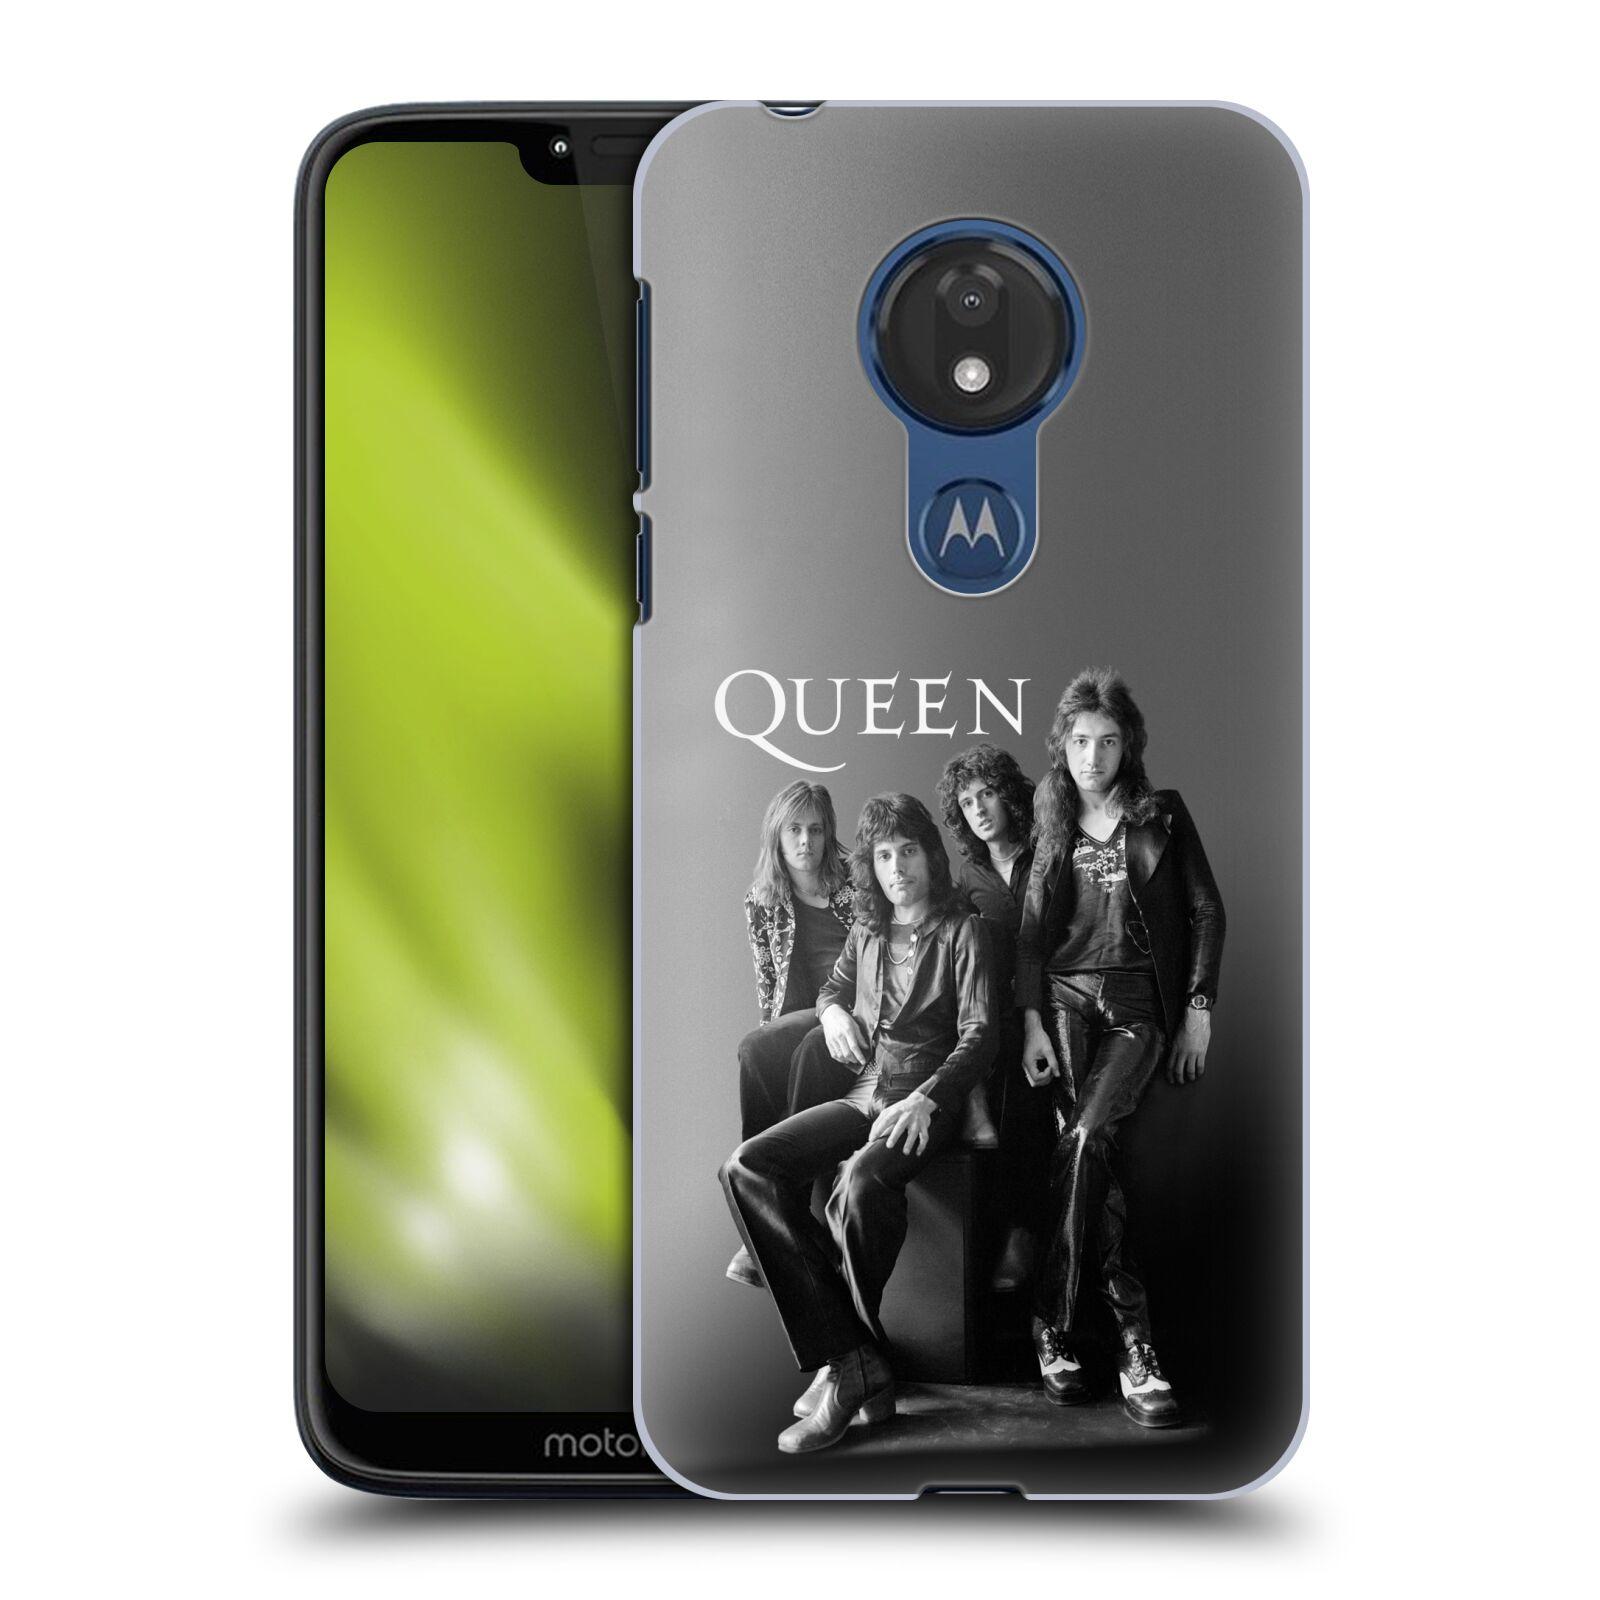 Plastové pouzdro na mobil Motorola Moto G7 Power - Head Case - Queen - Skupina